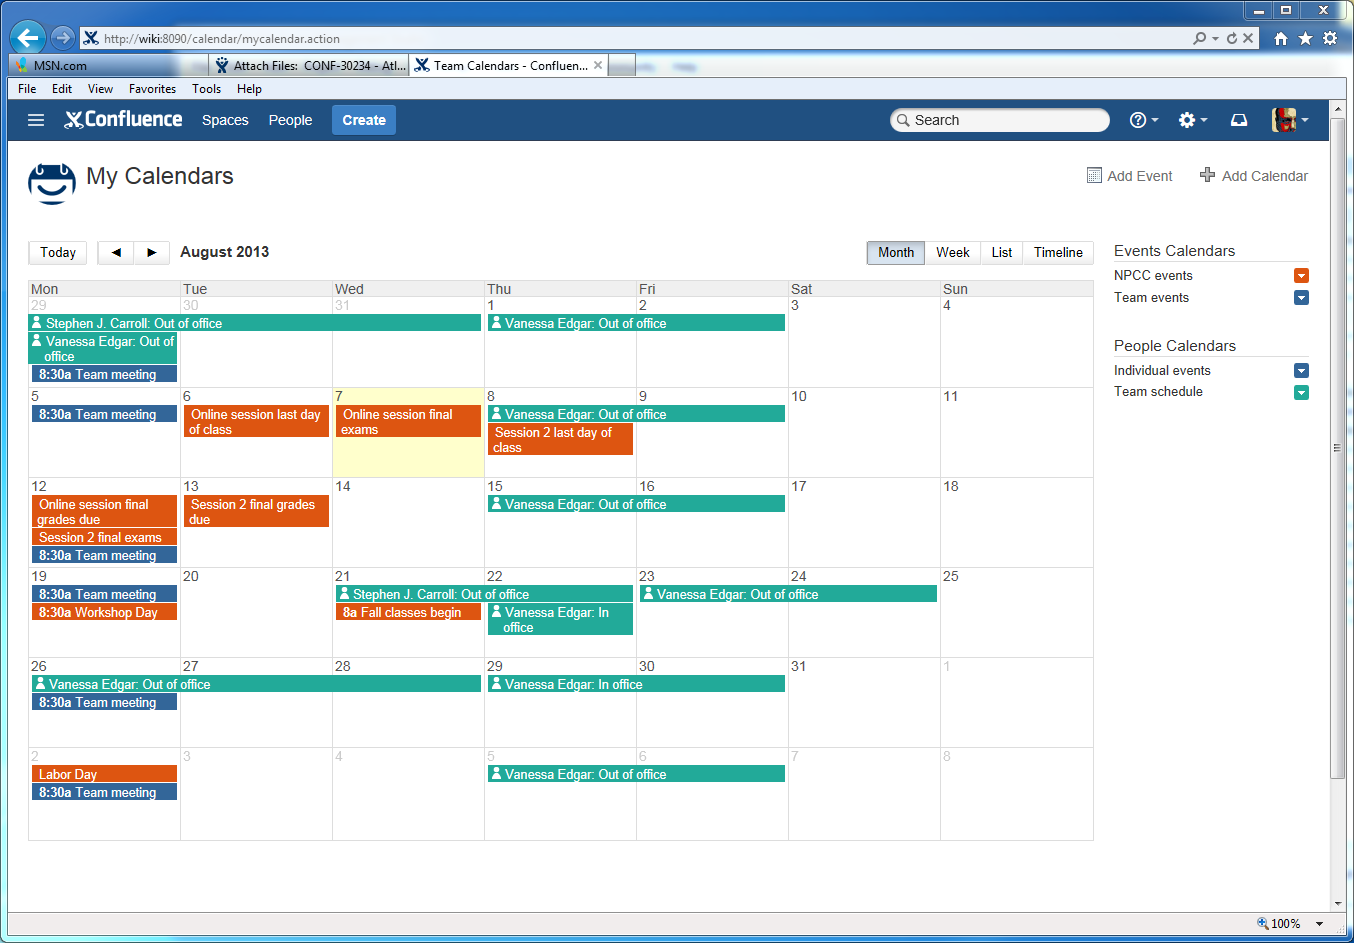 CONFSERVER-49922] Team Calendar grid/table - Atlassian JIRA